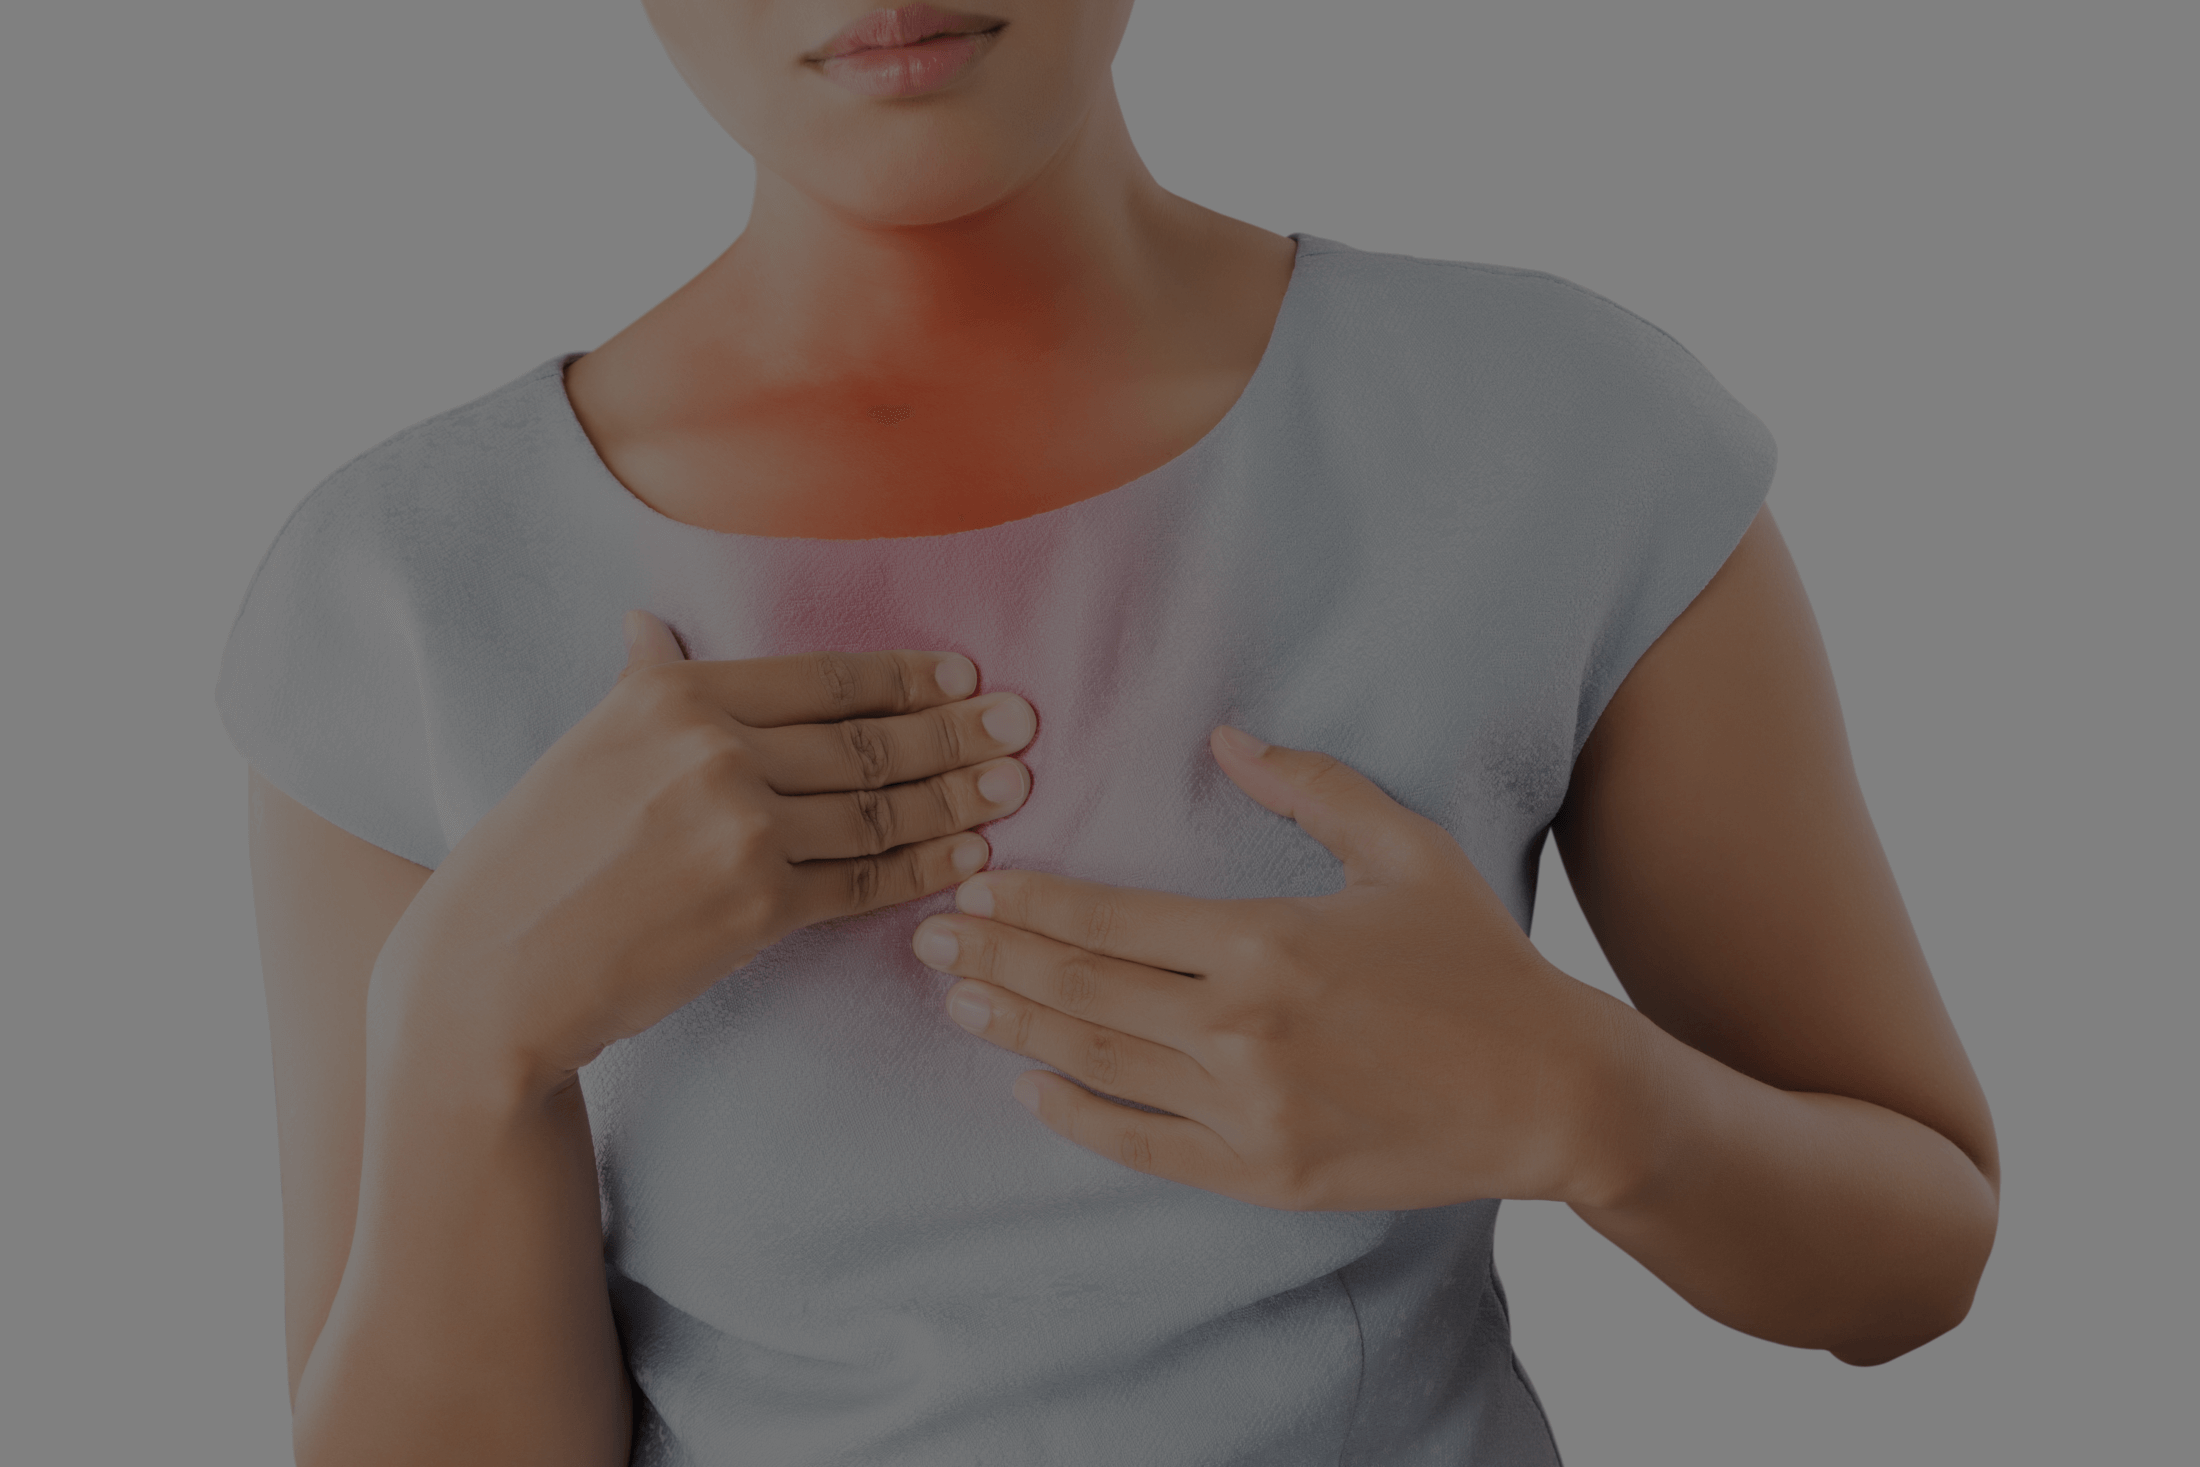 heartburn GERD acid reflux gastro atlanta GI doctors